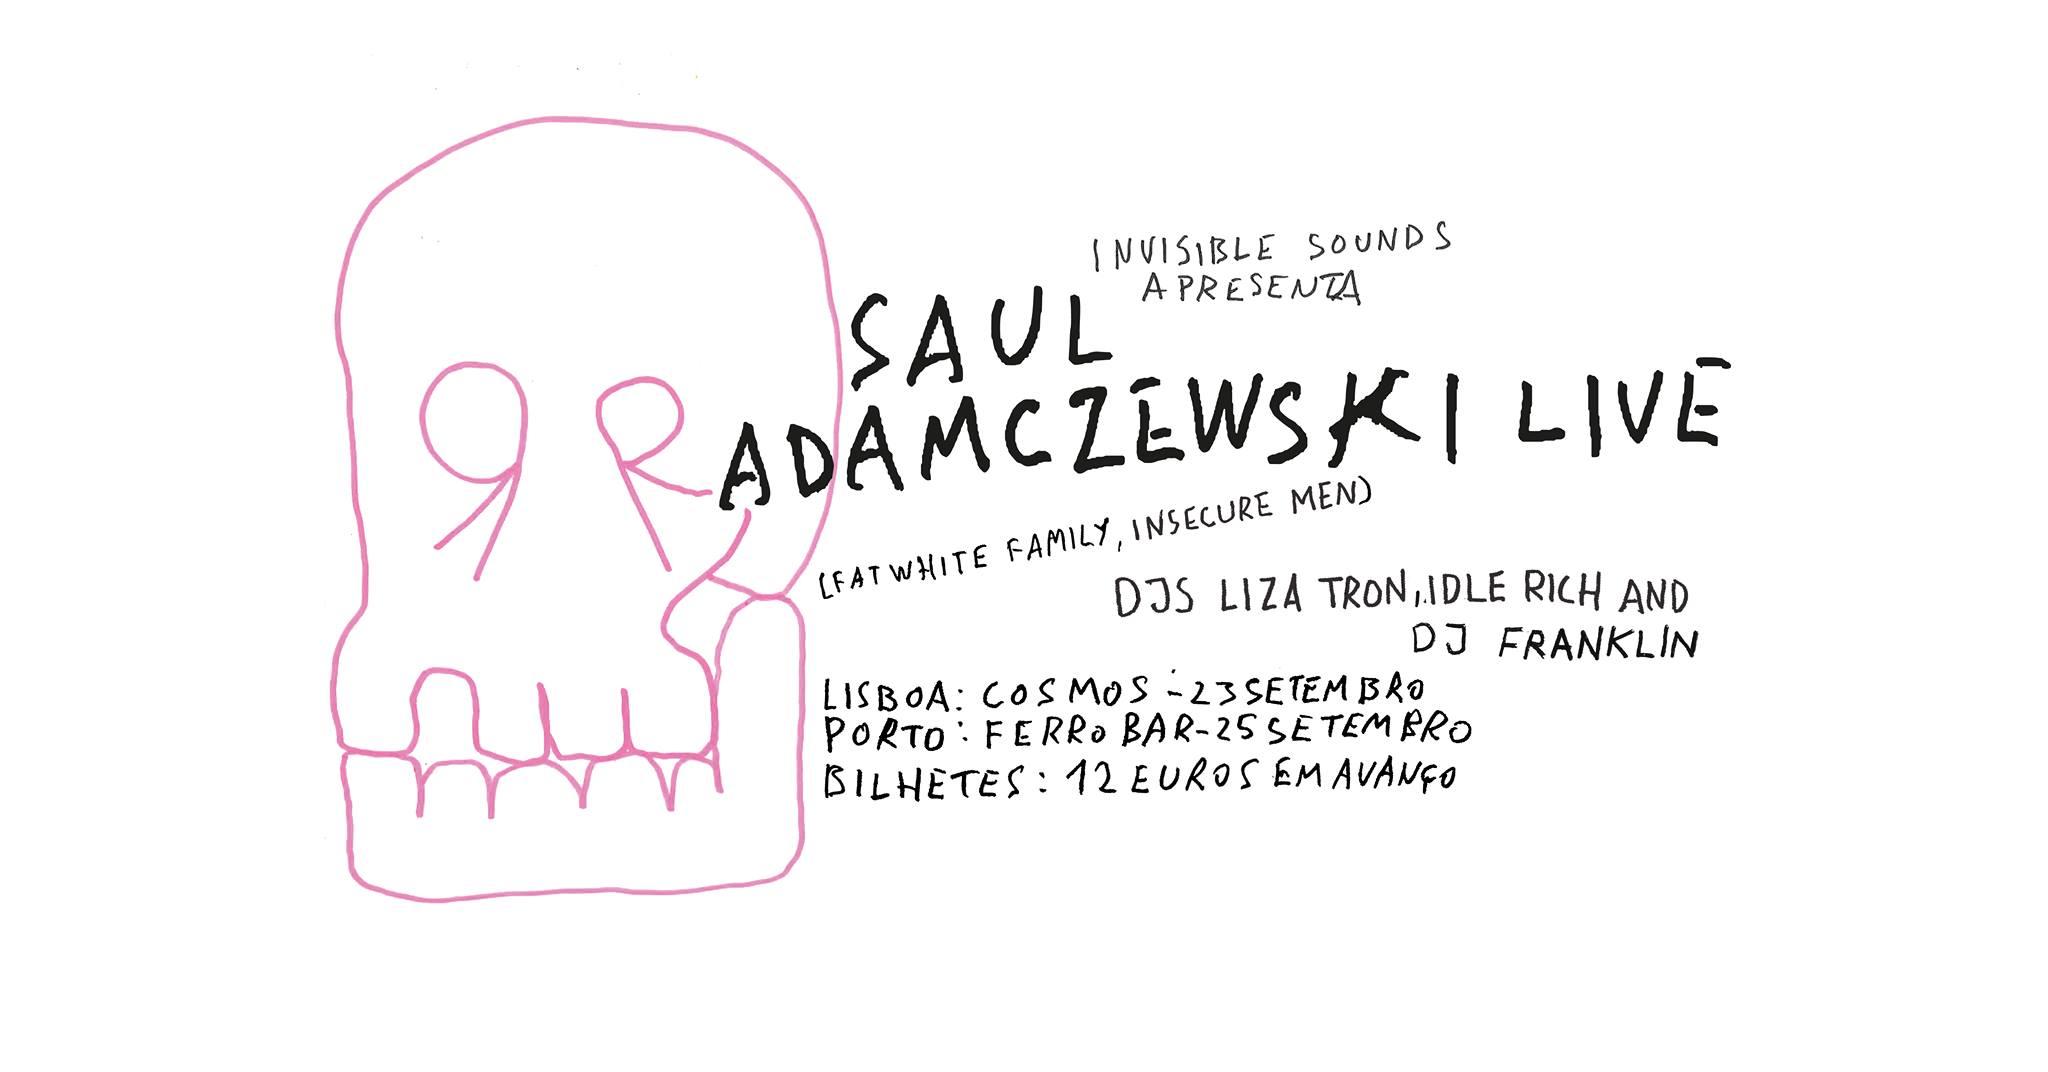 Saul Adamczewski (Fat White Family & Insecure men) @ Concerto